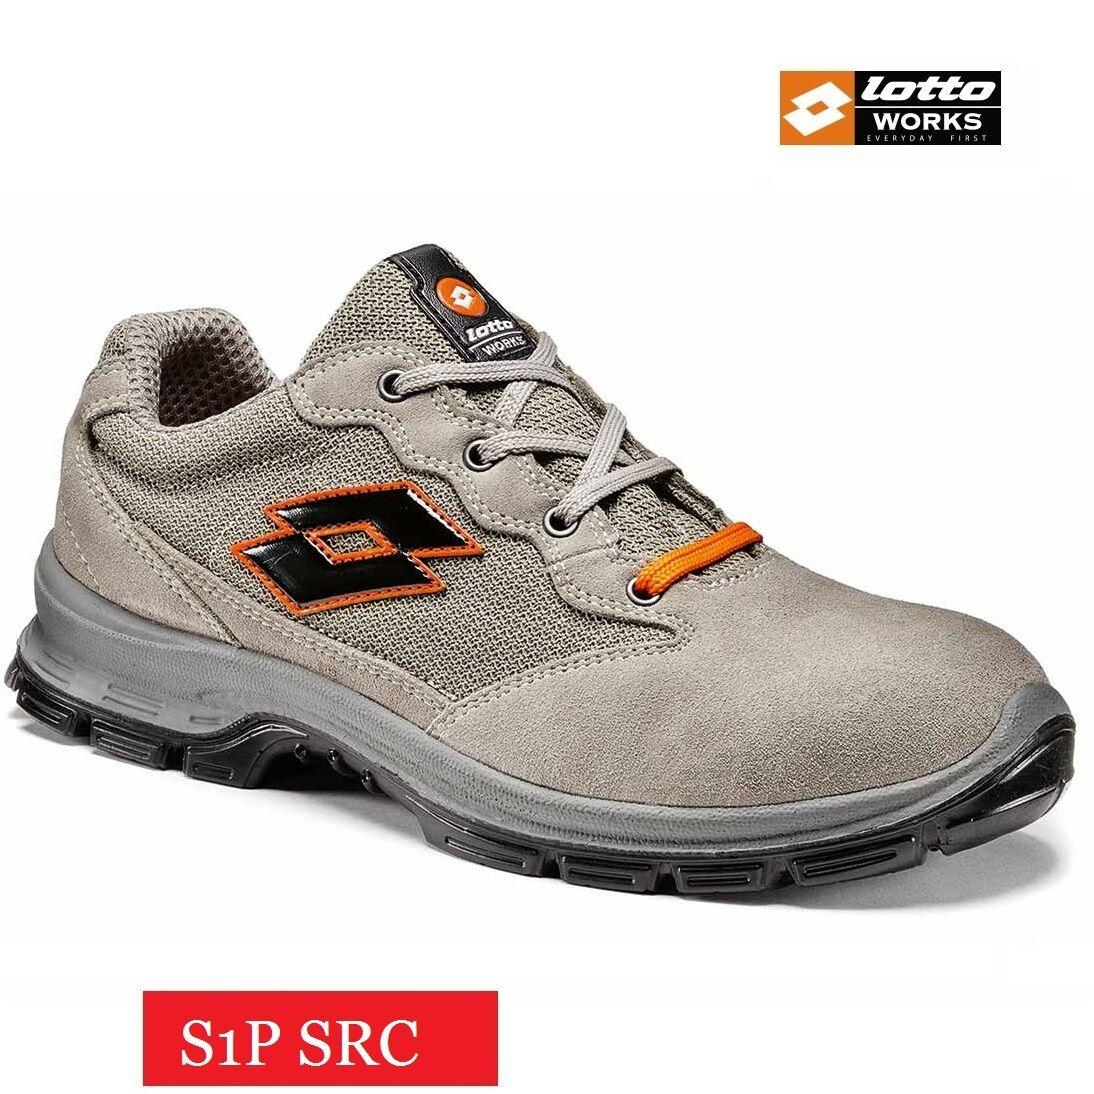 SCARPE ANTINFORTUNISTICHE LOTTO WORKS SPRINT 501 S1P SRC Q8357 PUNTALE ACCIAIO-